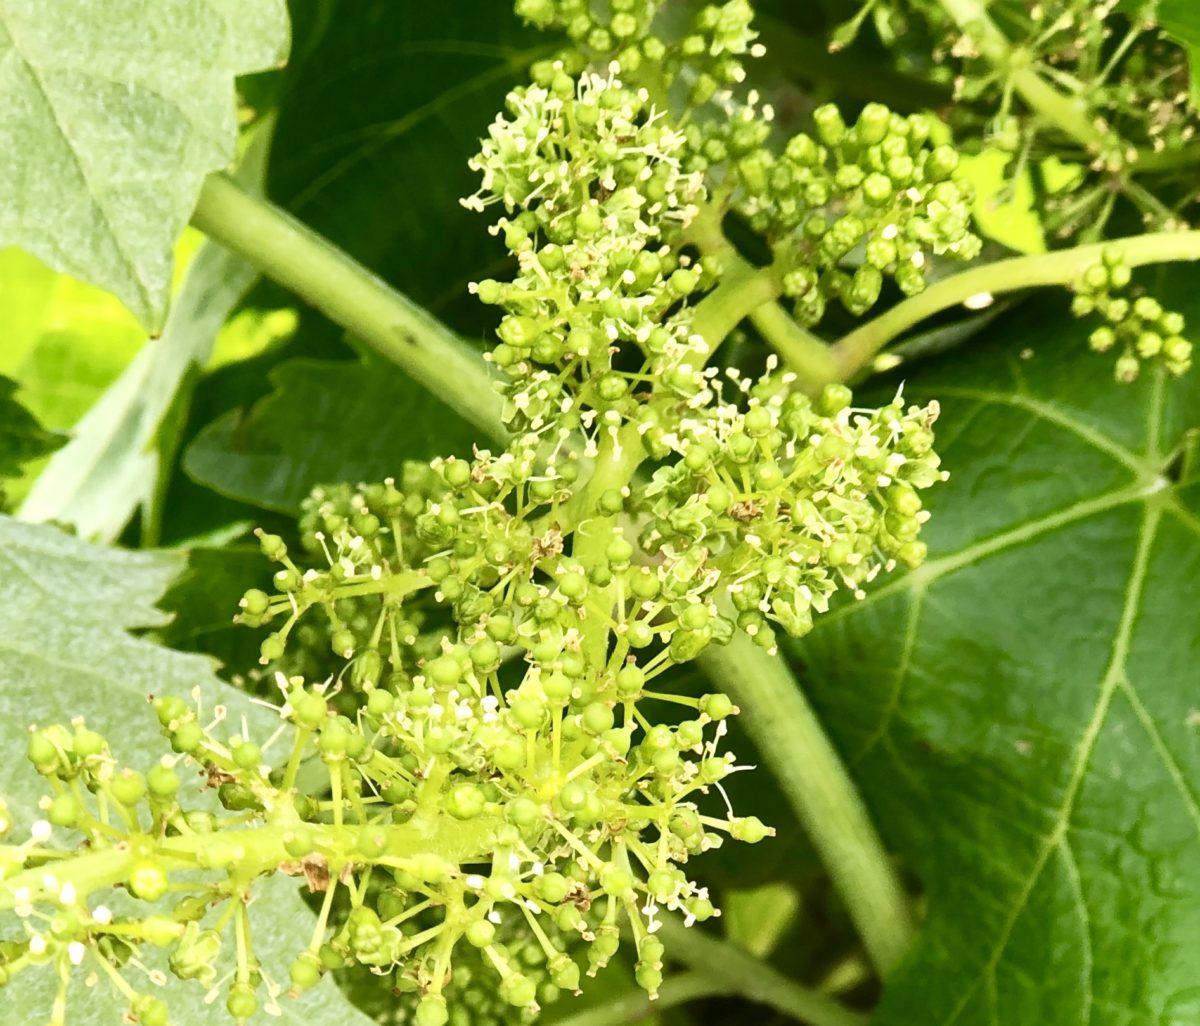 la fleur de vigne